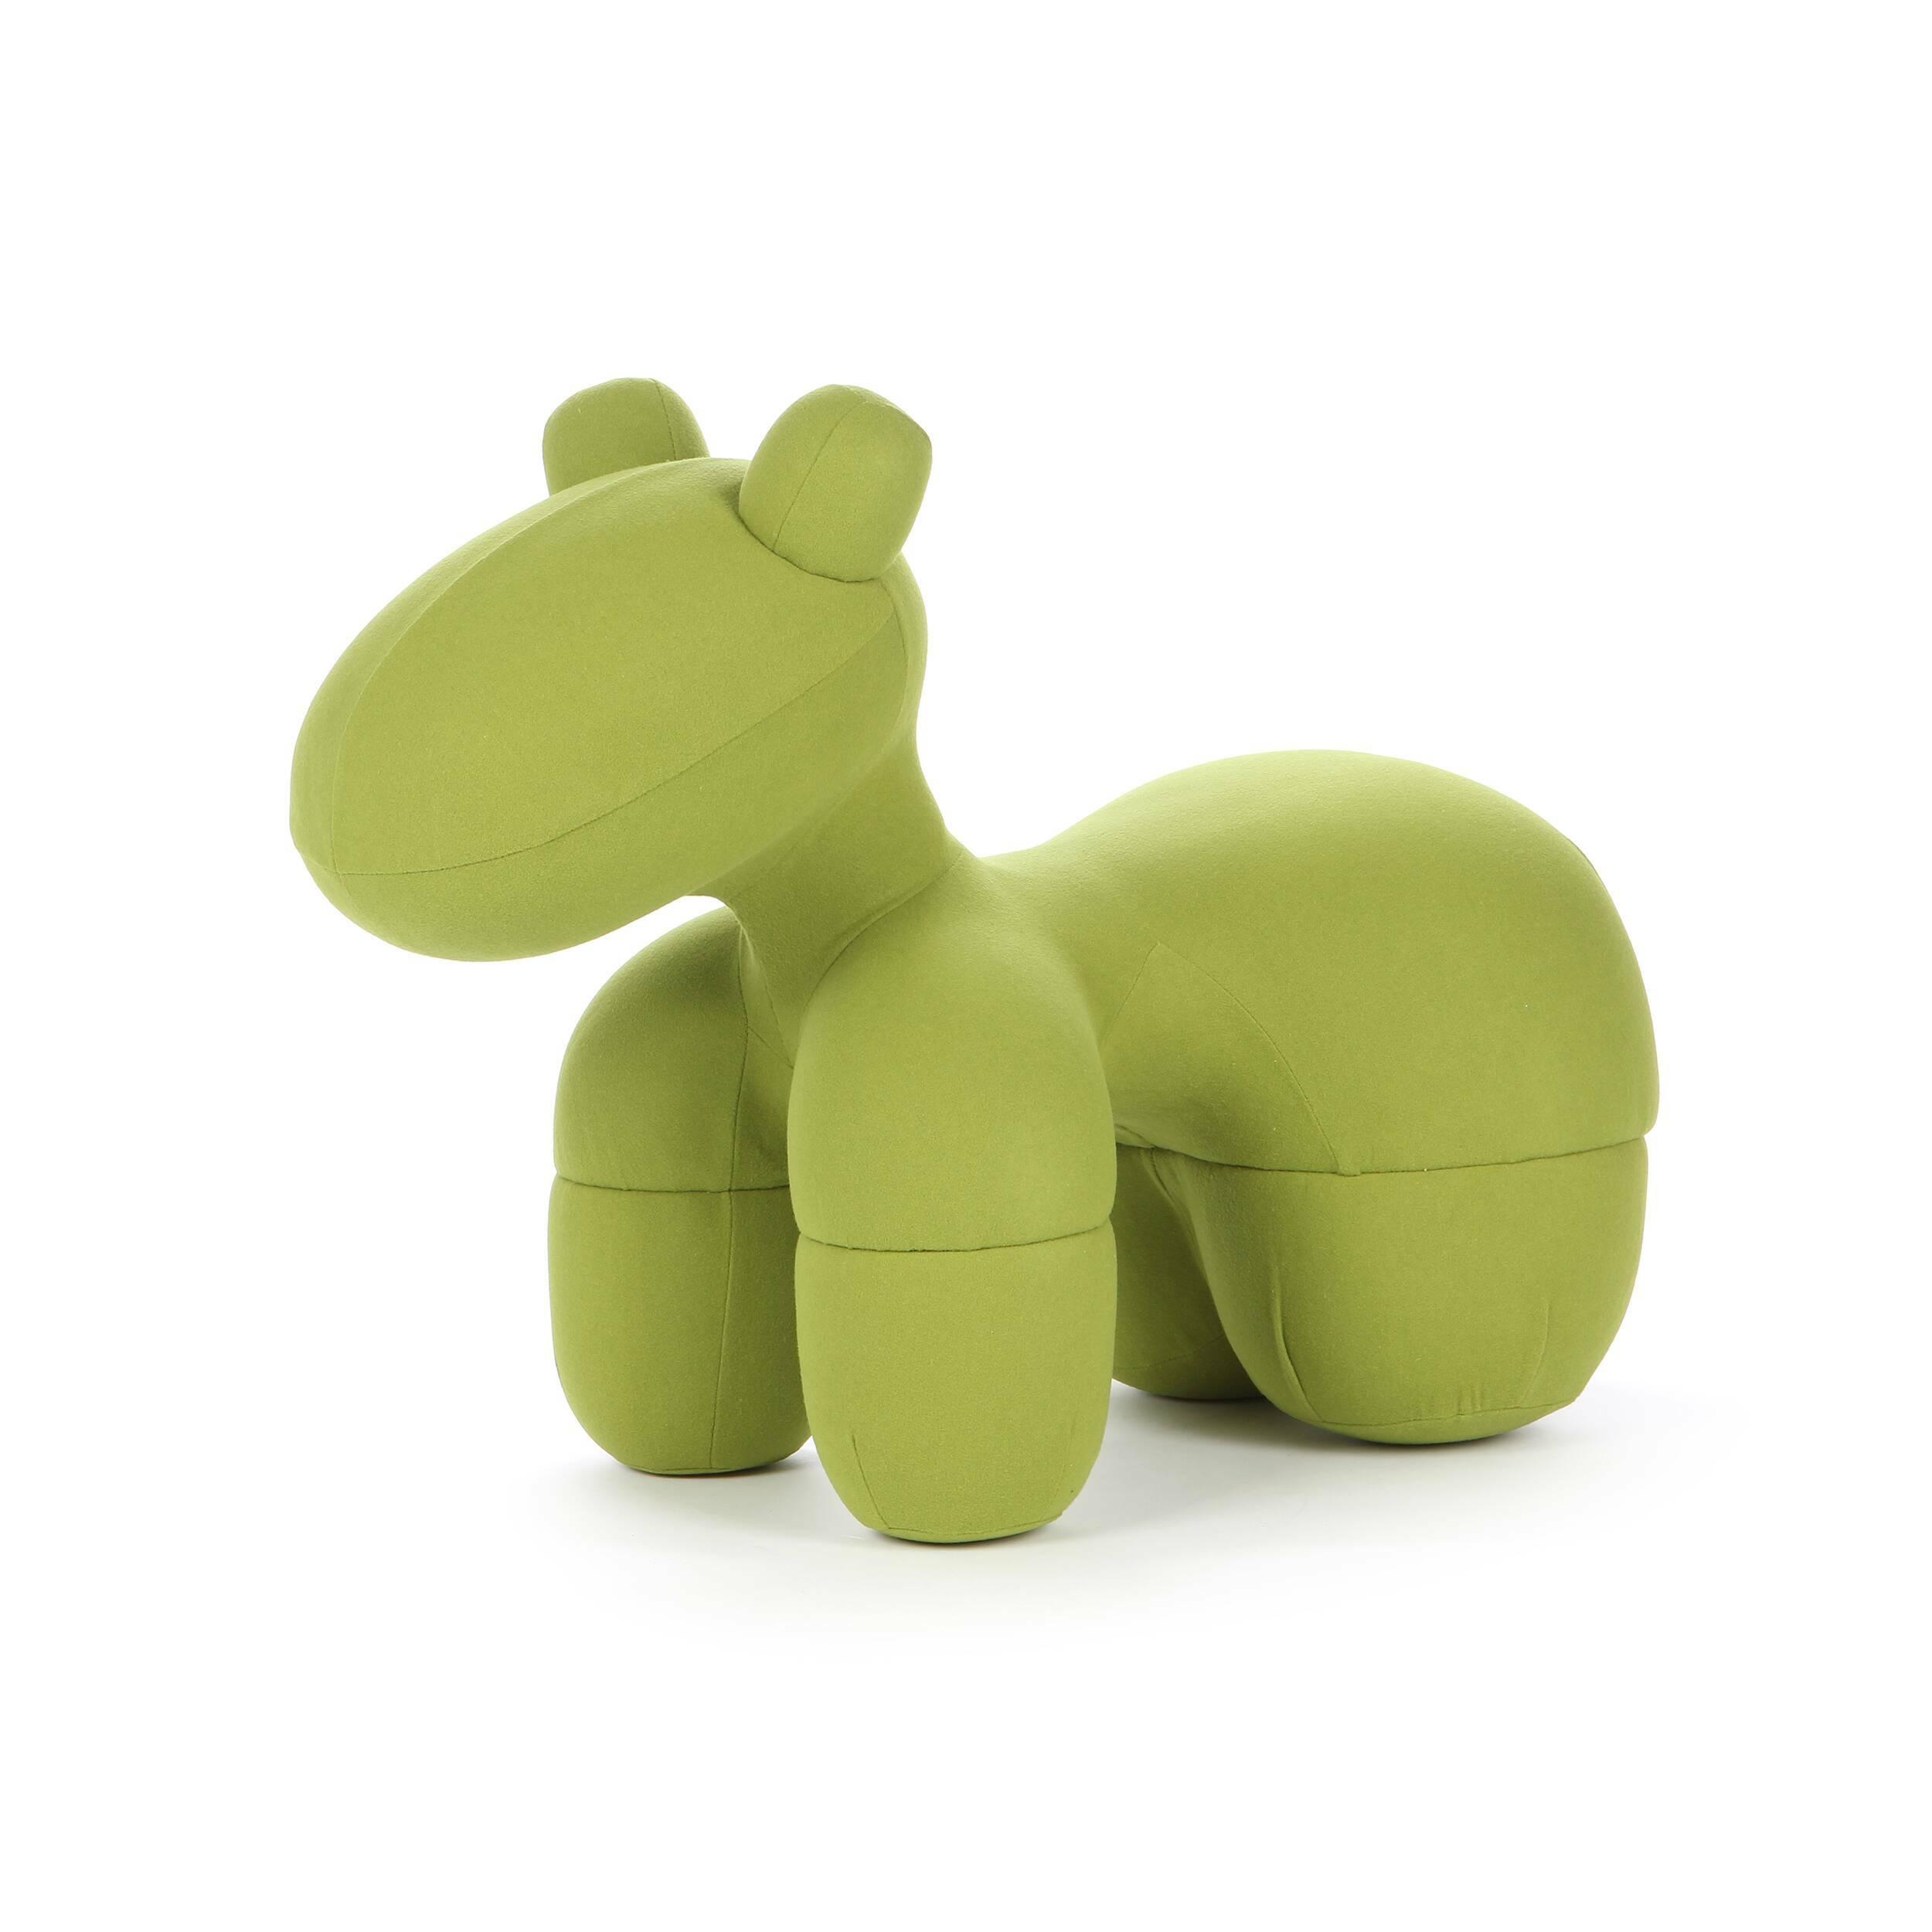 Кресло PonyМебель для детей<br><br><br>stock: 3<br>Высота: 76<br>Ширина: 57<br>Глубина: 110<br>Материал каркаса: Кашемир<br>Тип материала каркаса: Ткань<br>Цвет каркаса: Зеленый